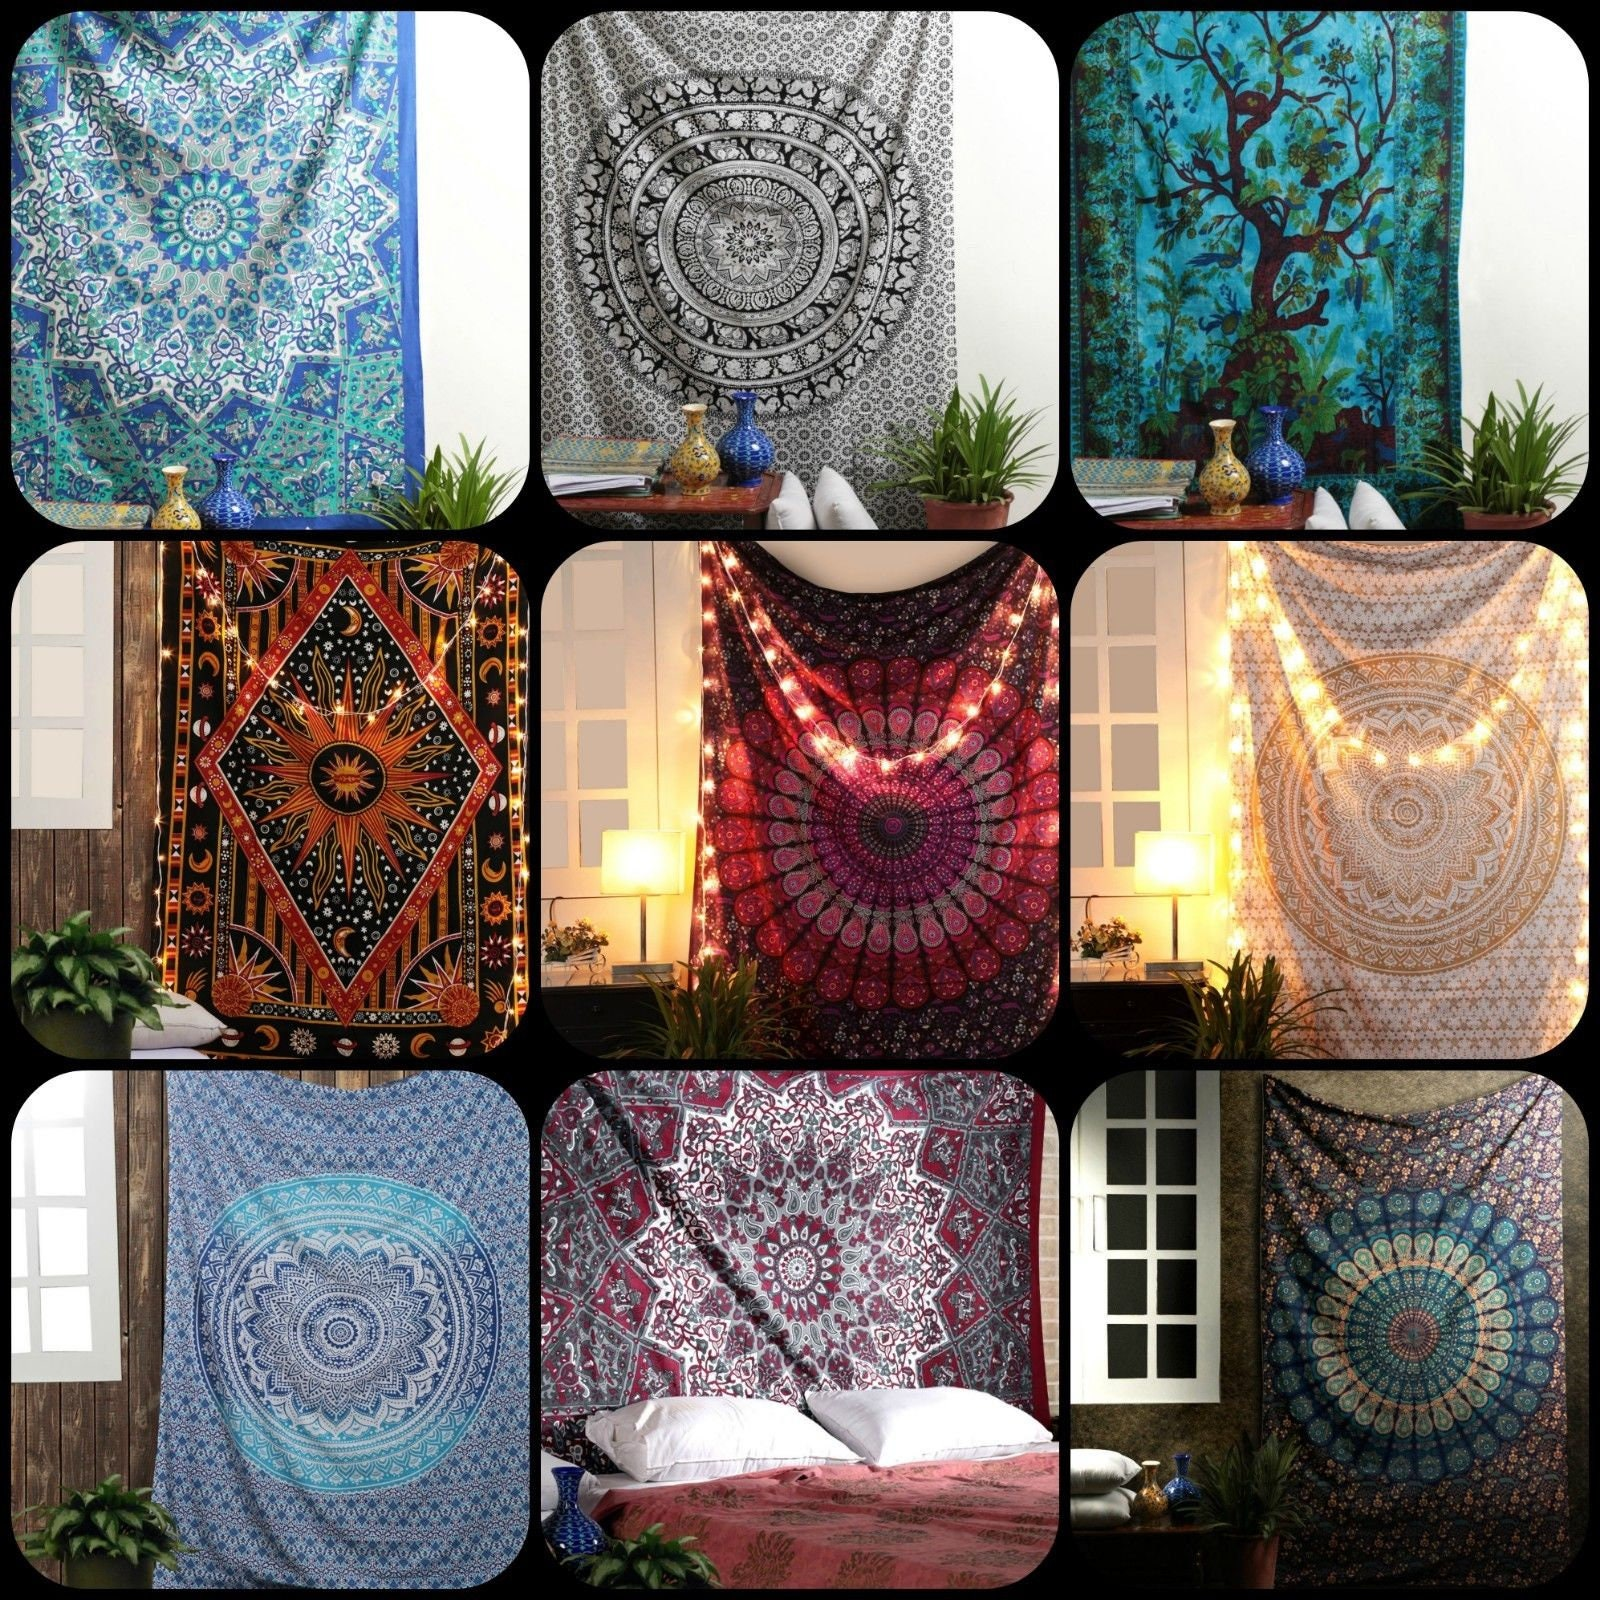 10 Pcs Wholesale Lot Bohemian Mandala Tapestry Throw Indian Decor Wall Hanging